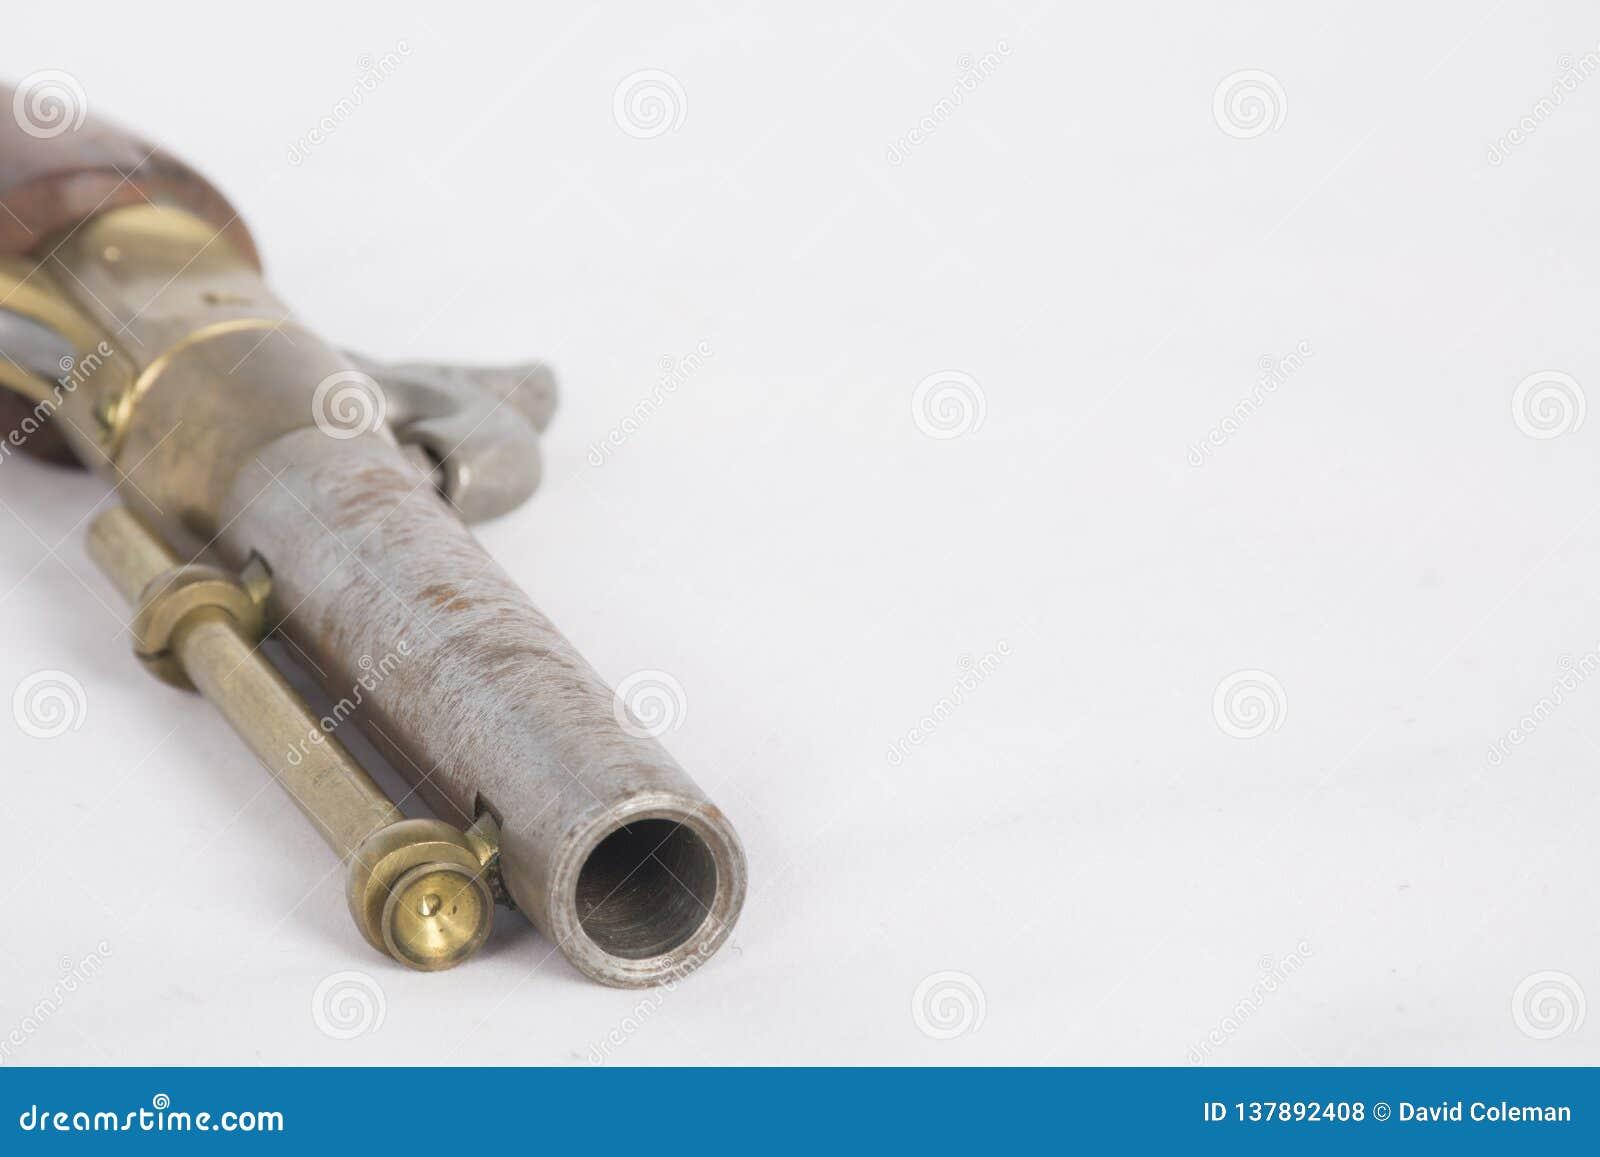 Old Fashioned Black Powder Pistol Stock Photo - Image of